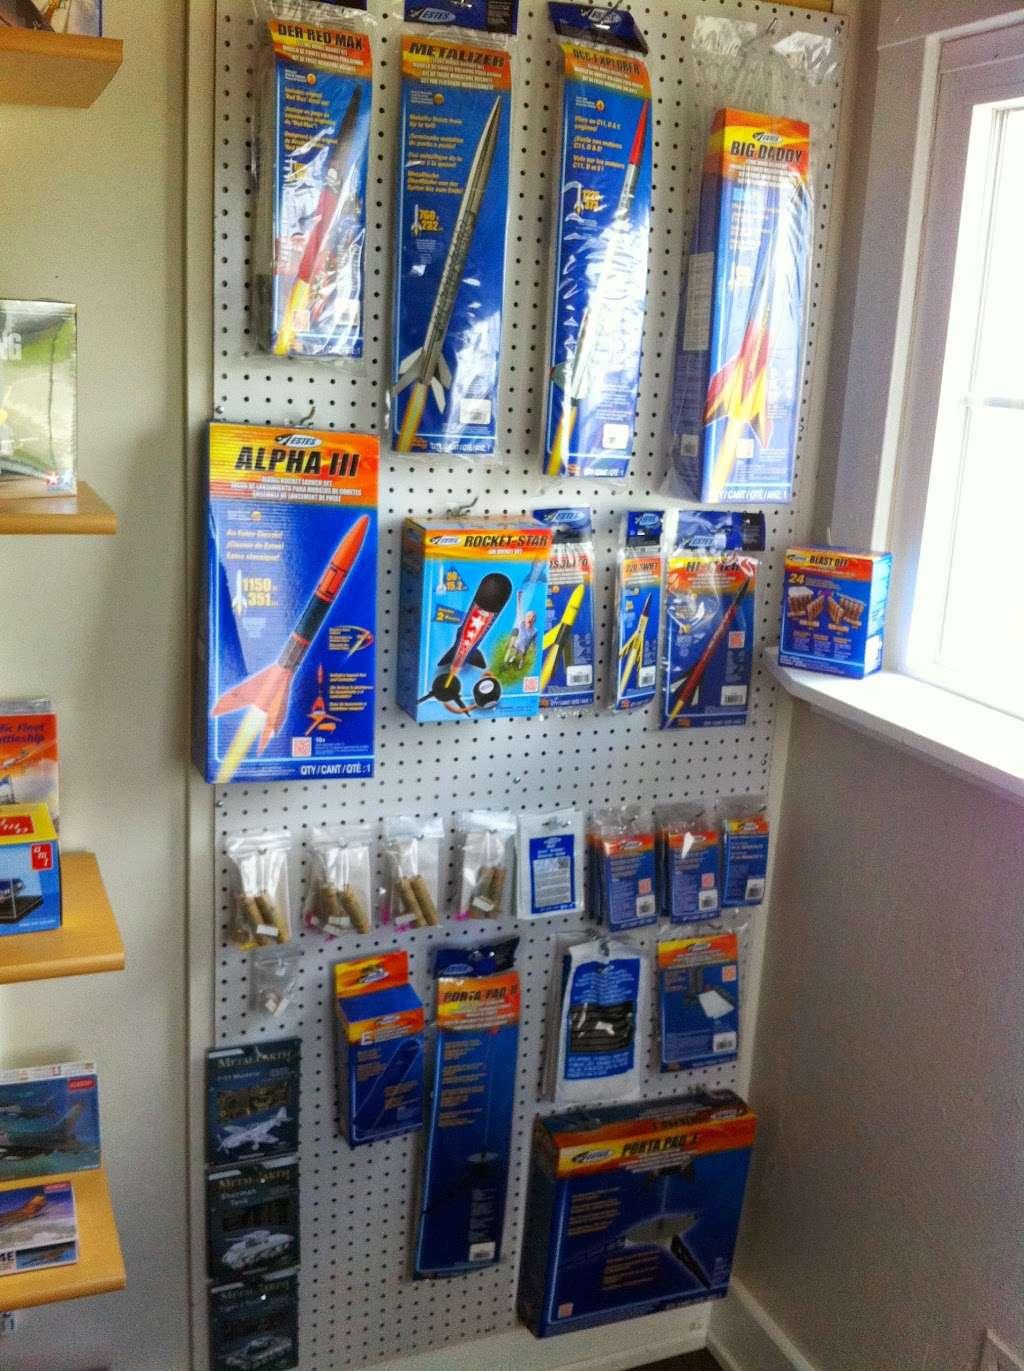 Jersey Hobby - store  | Photo 7 of 10 | Address: 76 U.S. 202 Central NJ Flemington Area U.S, Ringoes, NJ 08551, USA | Phone: (908) 968-4880